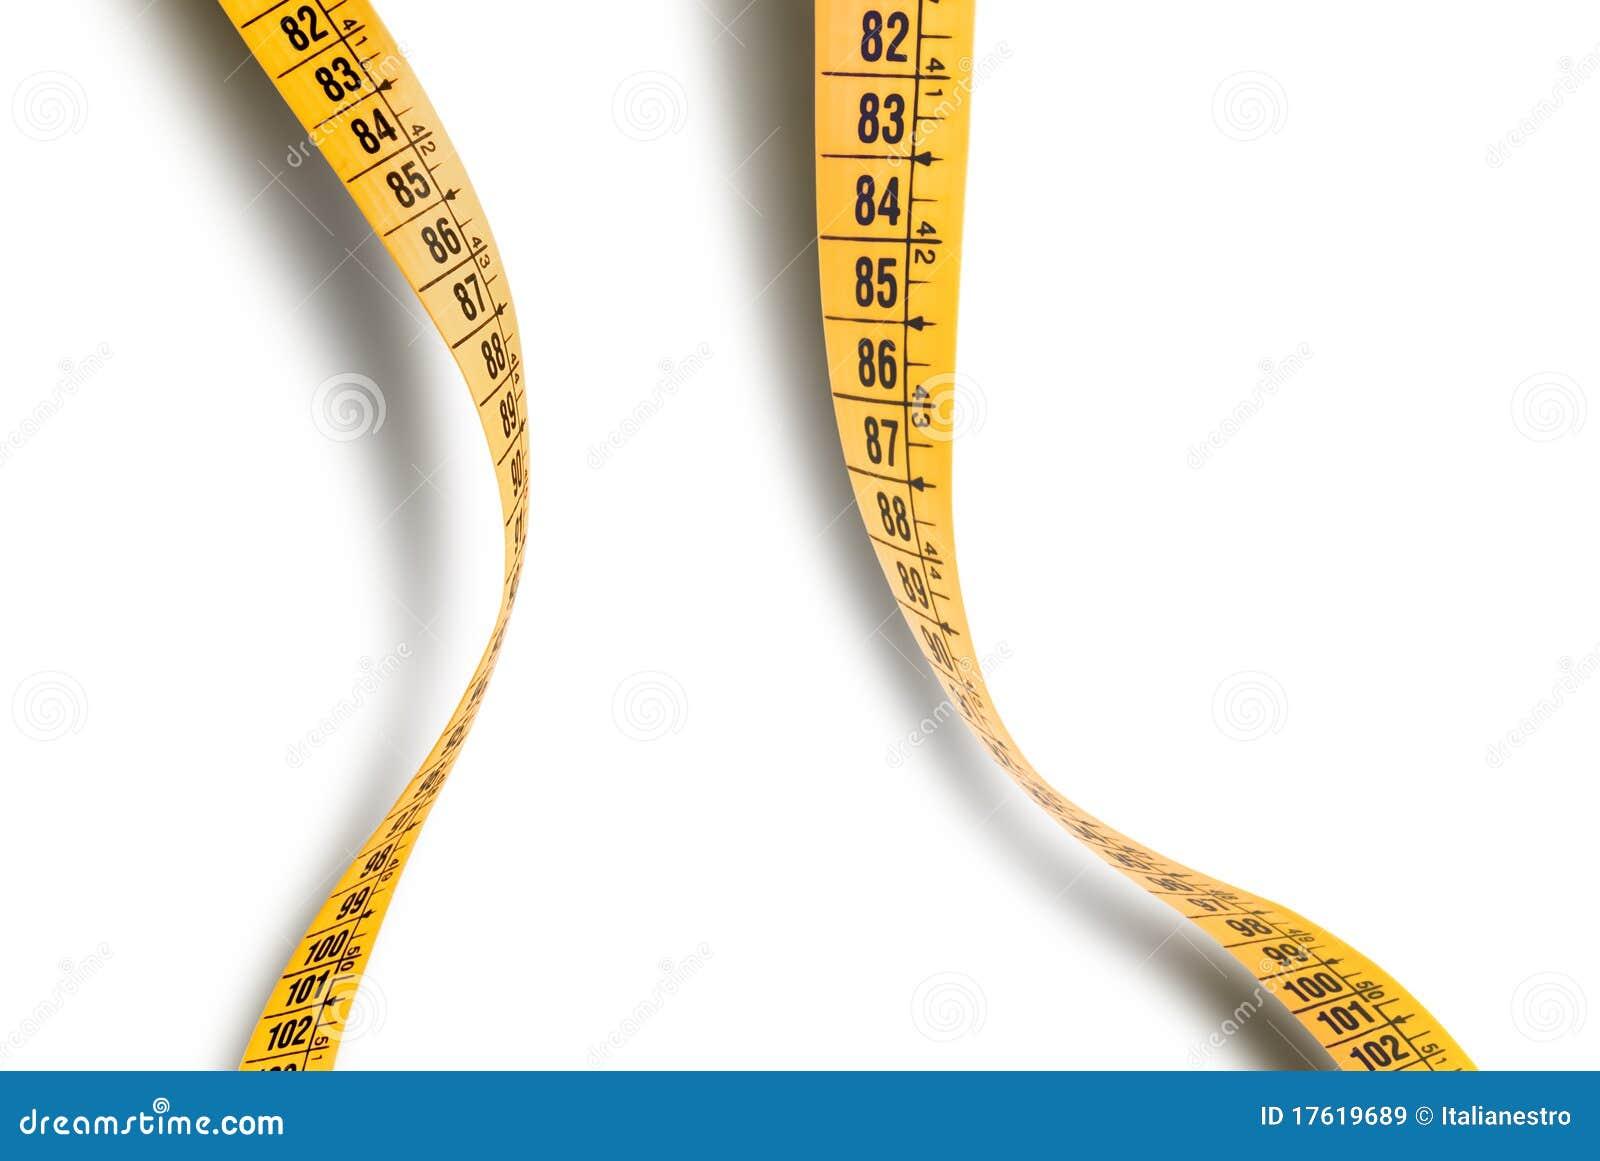 Wavy measuring tape